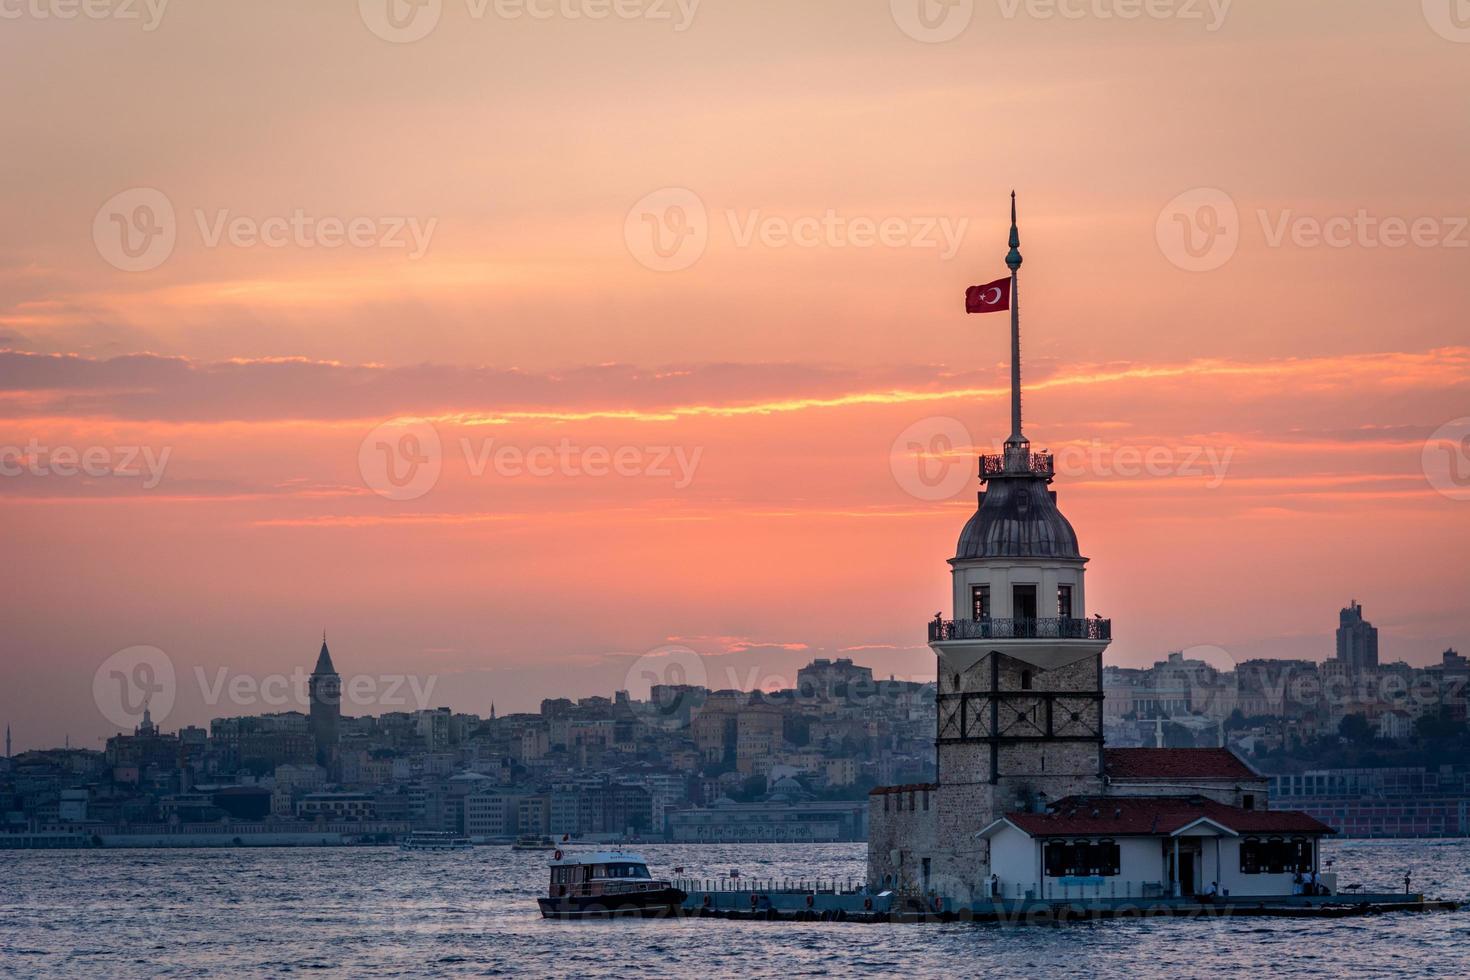 Jungfrauenturm im Sonnenuntergang. Istanbul, Türkei foto